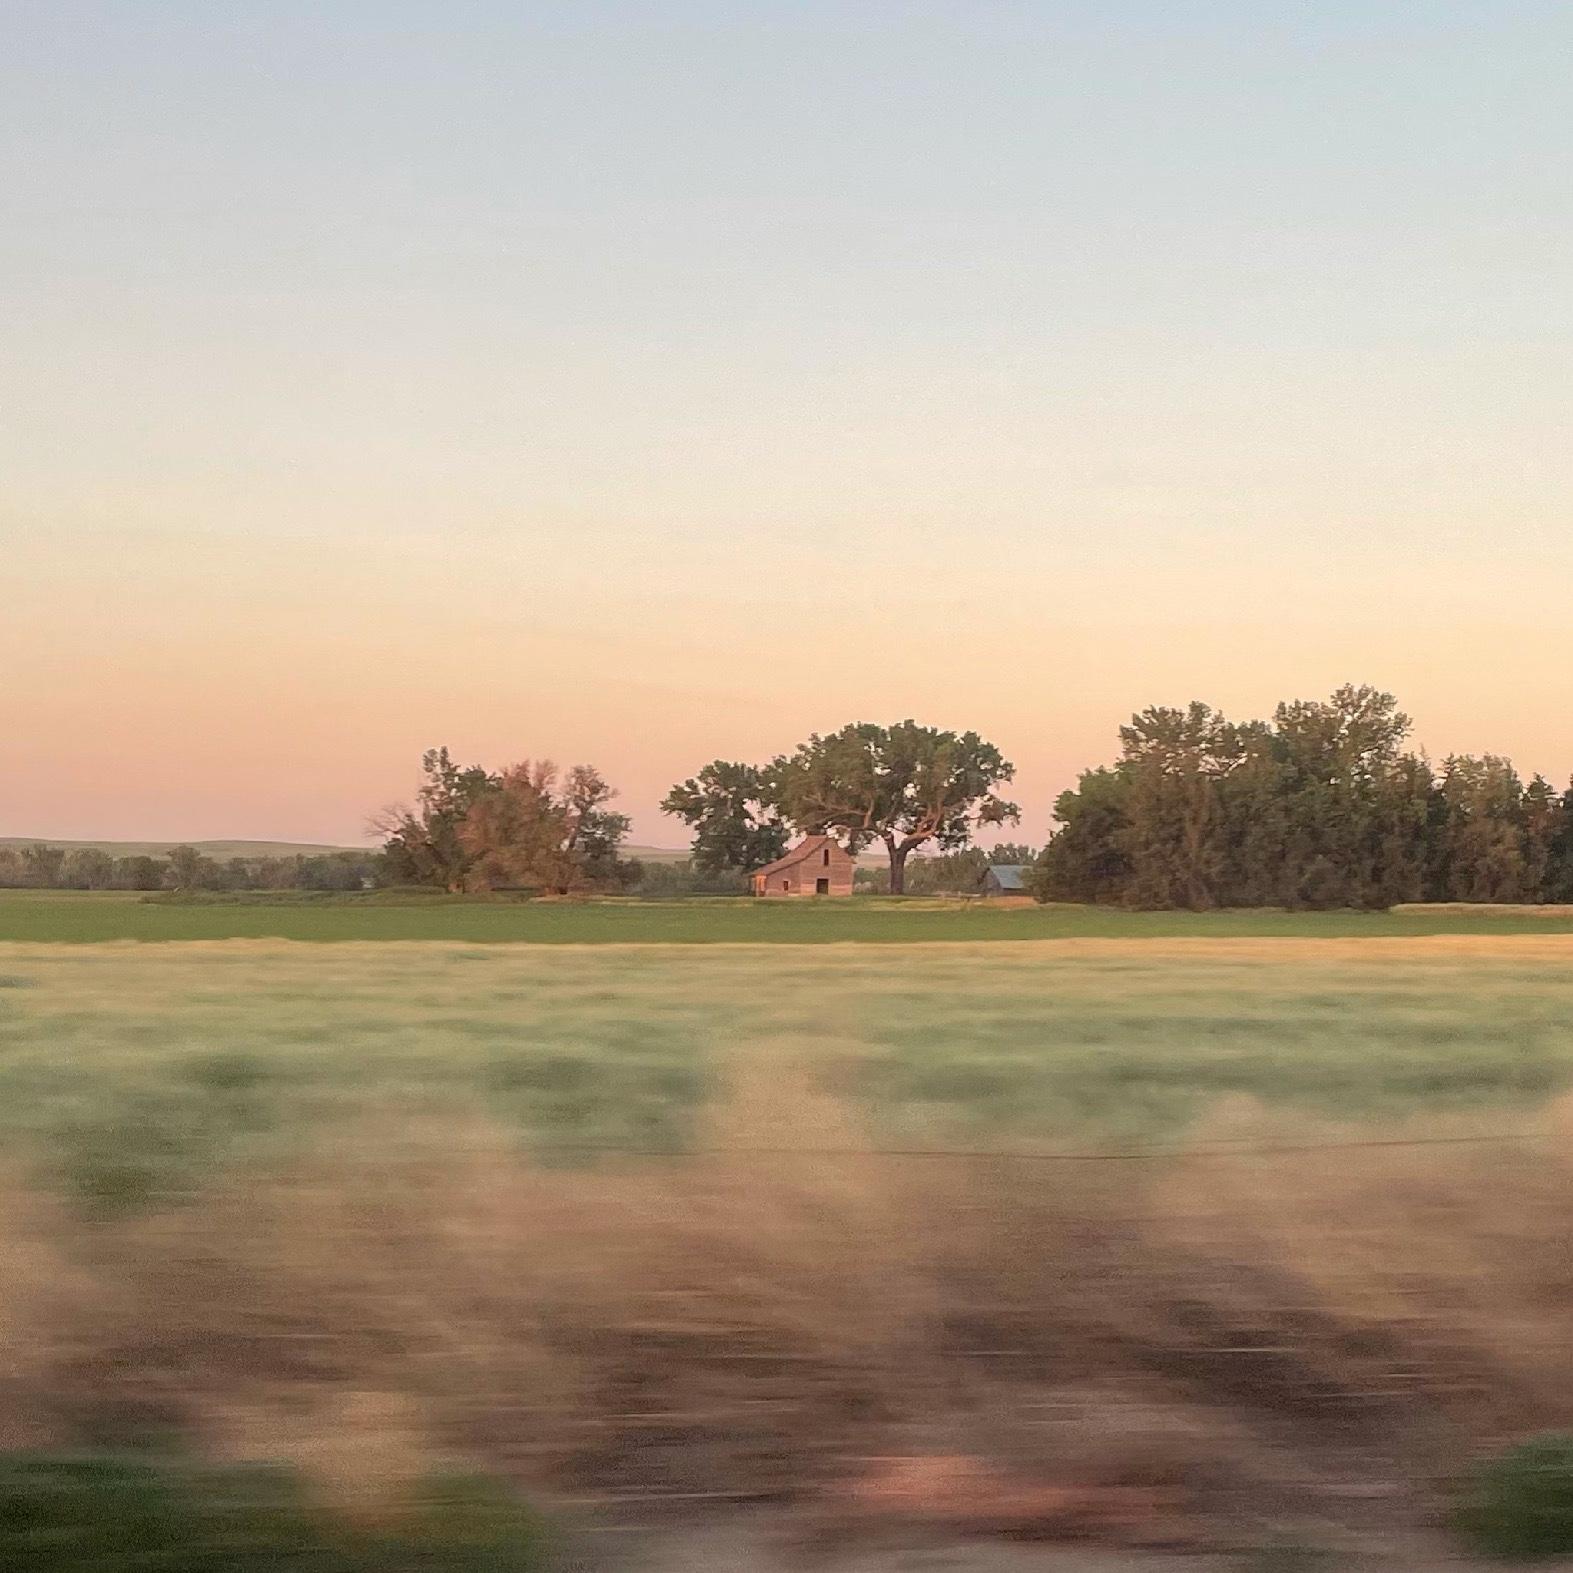 2021 summer adventure part 2: Amtrak to Denver